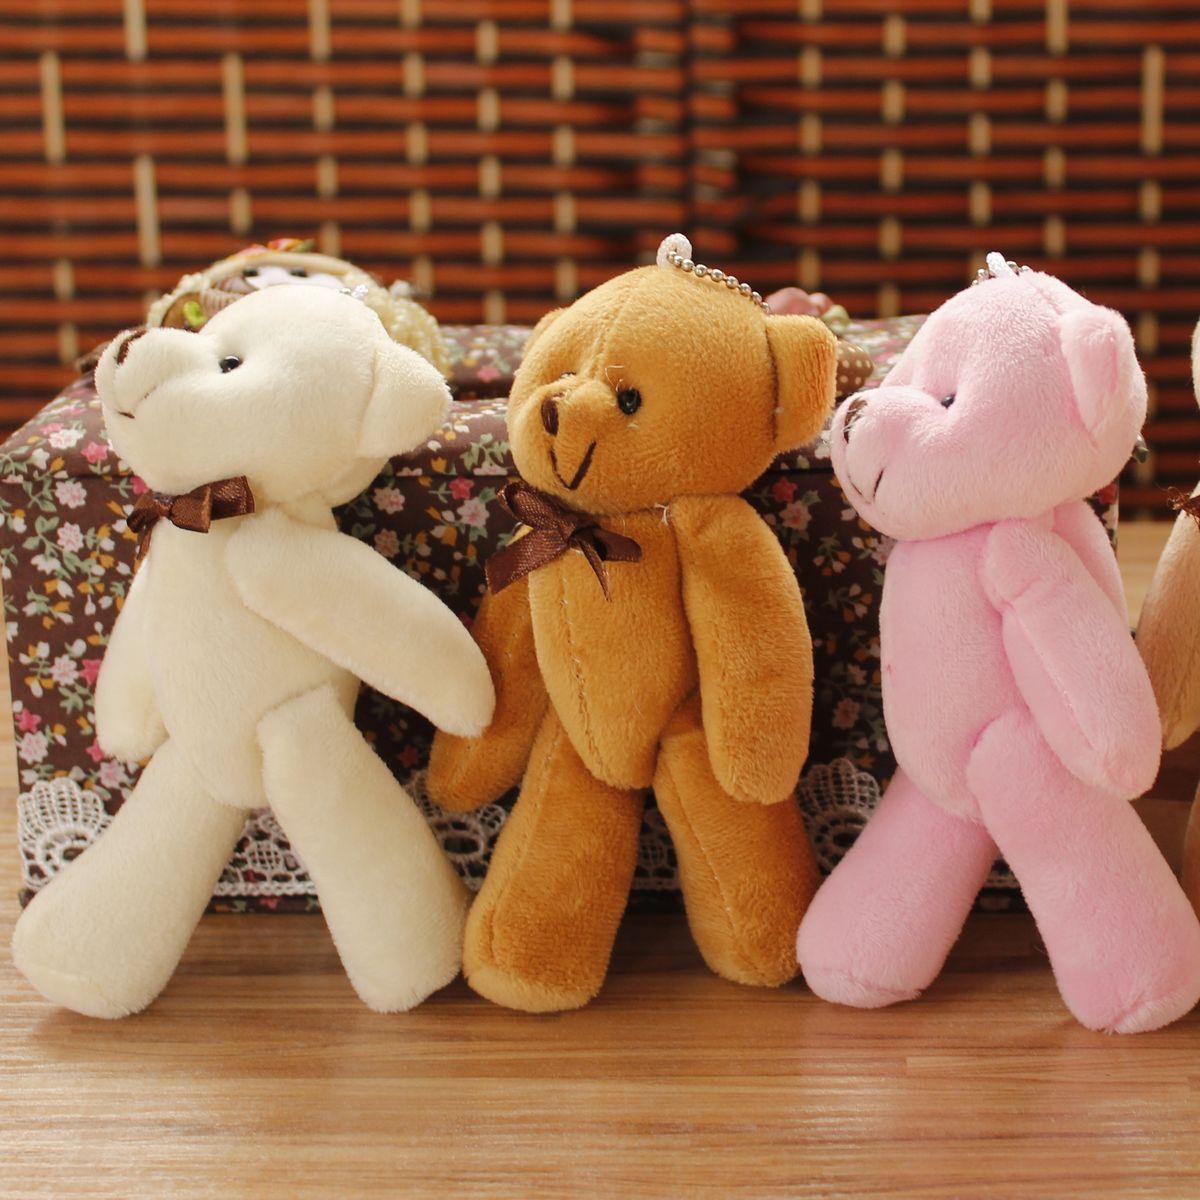 Small doll pendant teddy bear bags accessories wedding doll keychain dolls(China (Mainland))